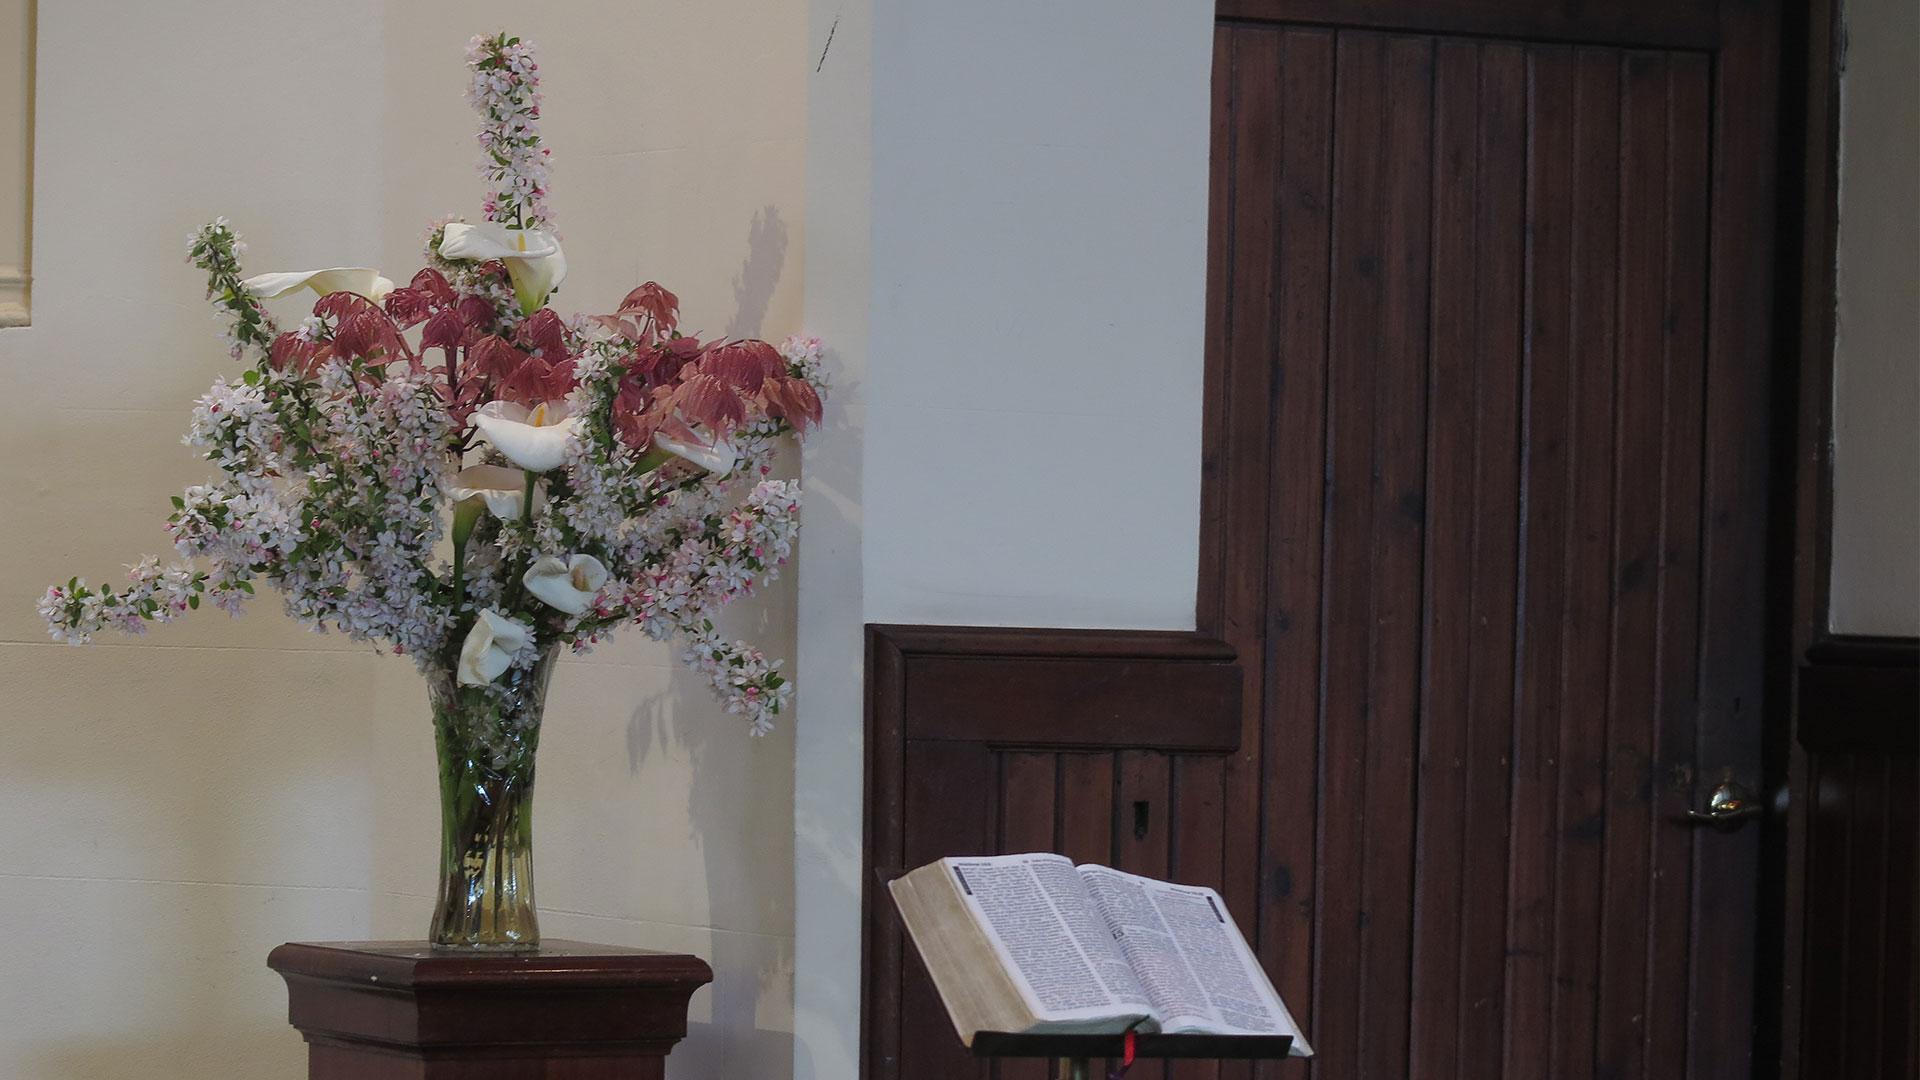 Sunday Prayers 1/10